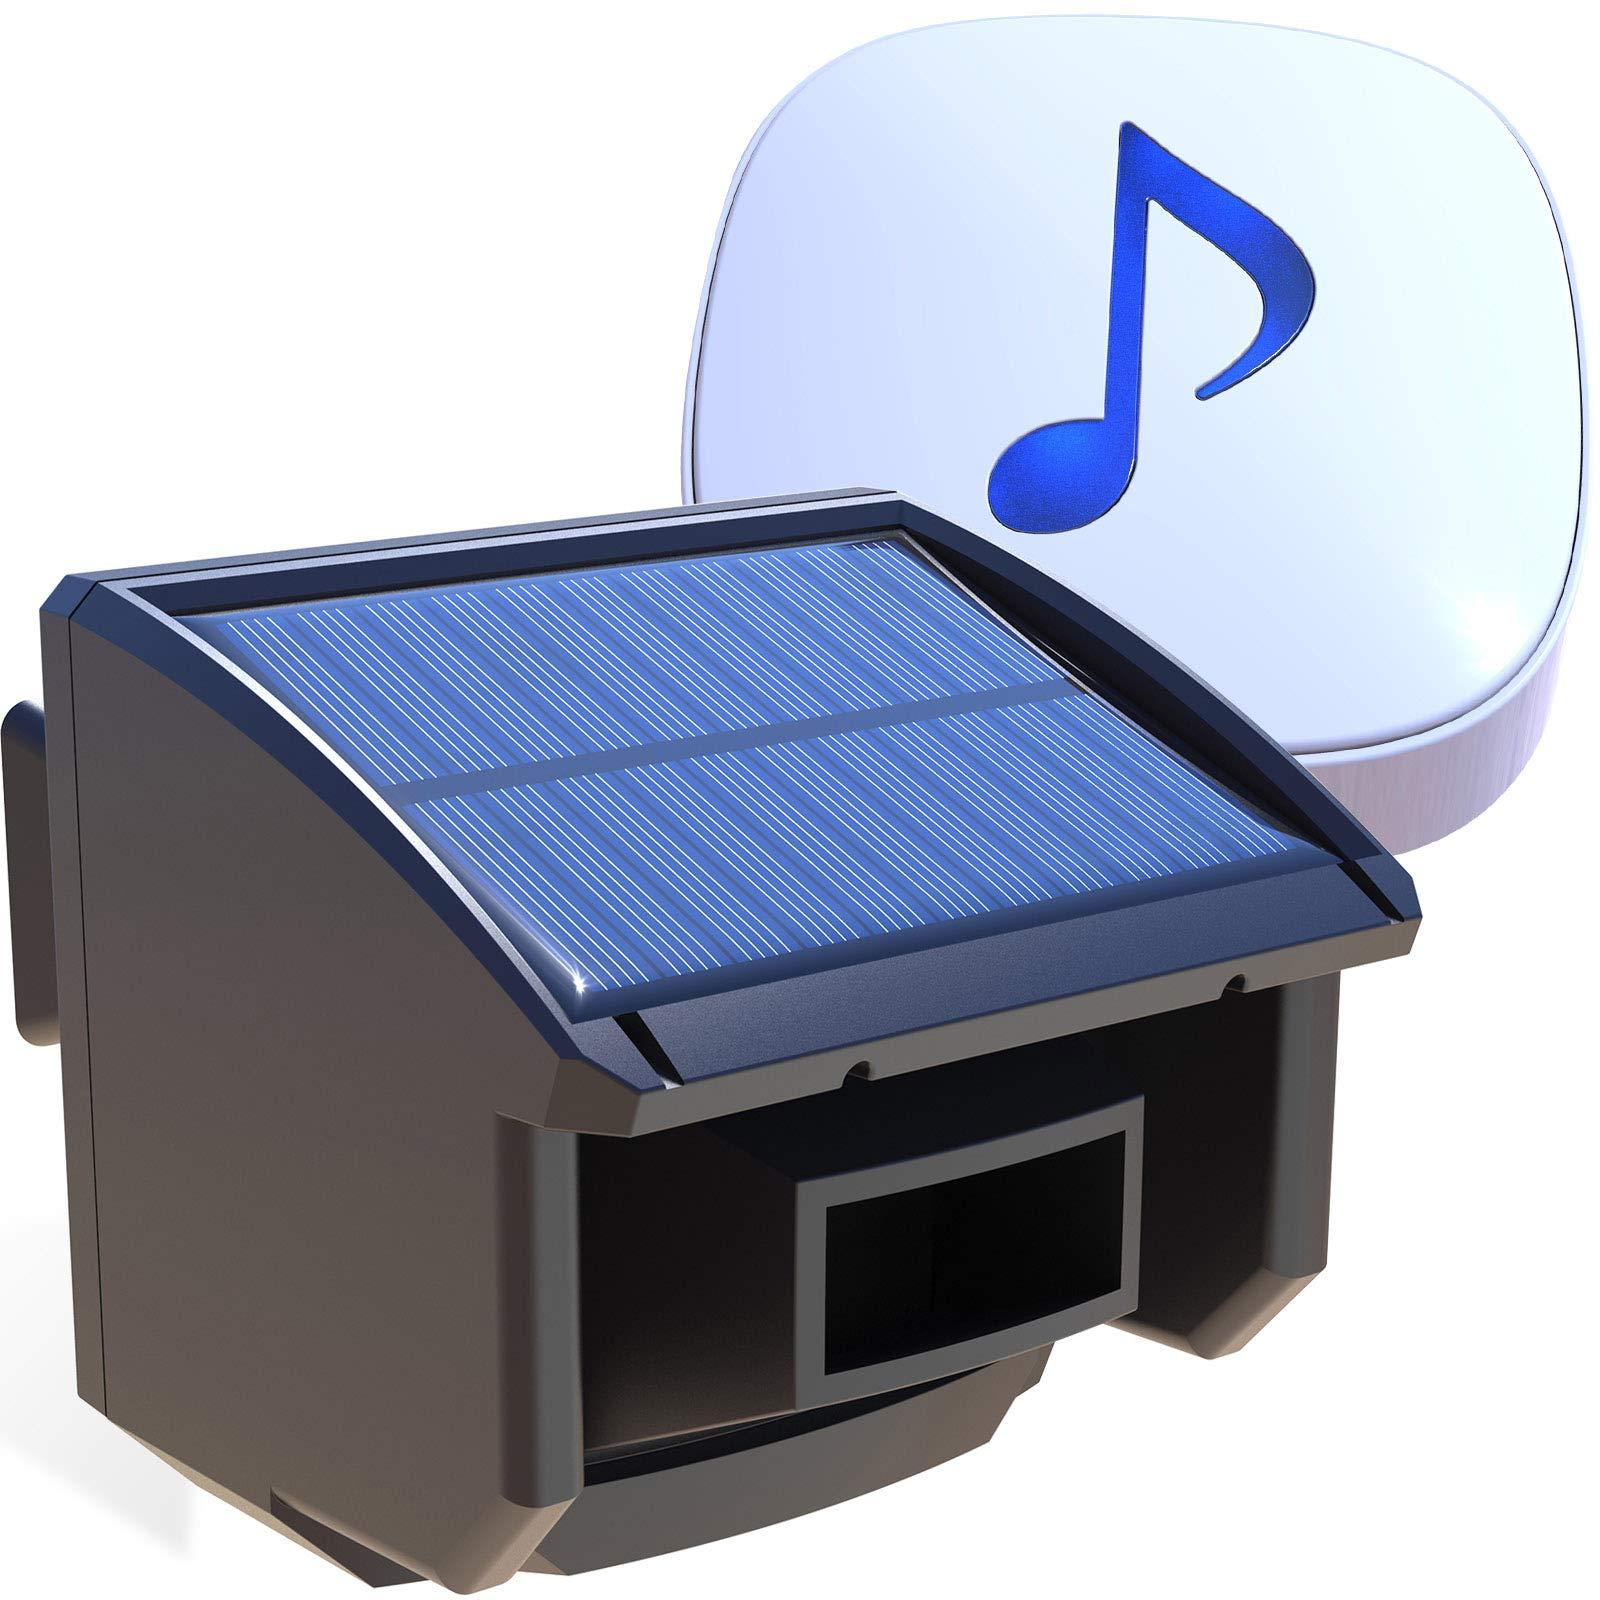 Driveway Transmission Range Solar Batteries Outdoor Weatherproof